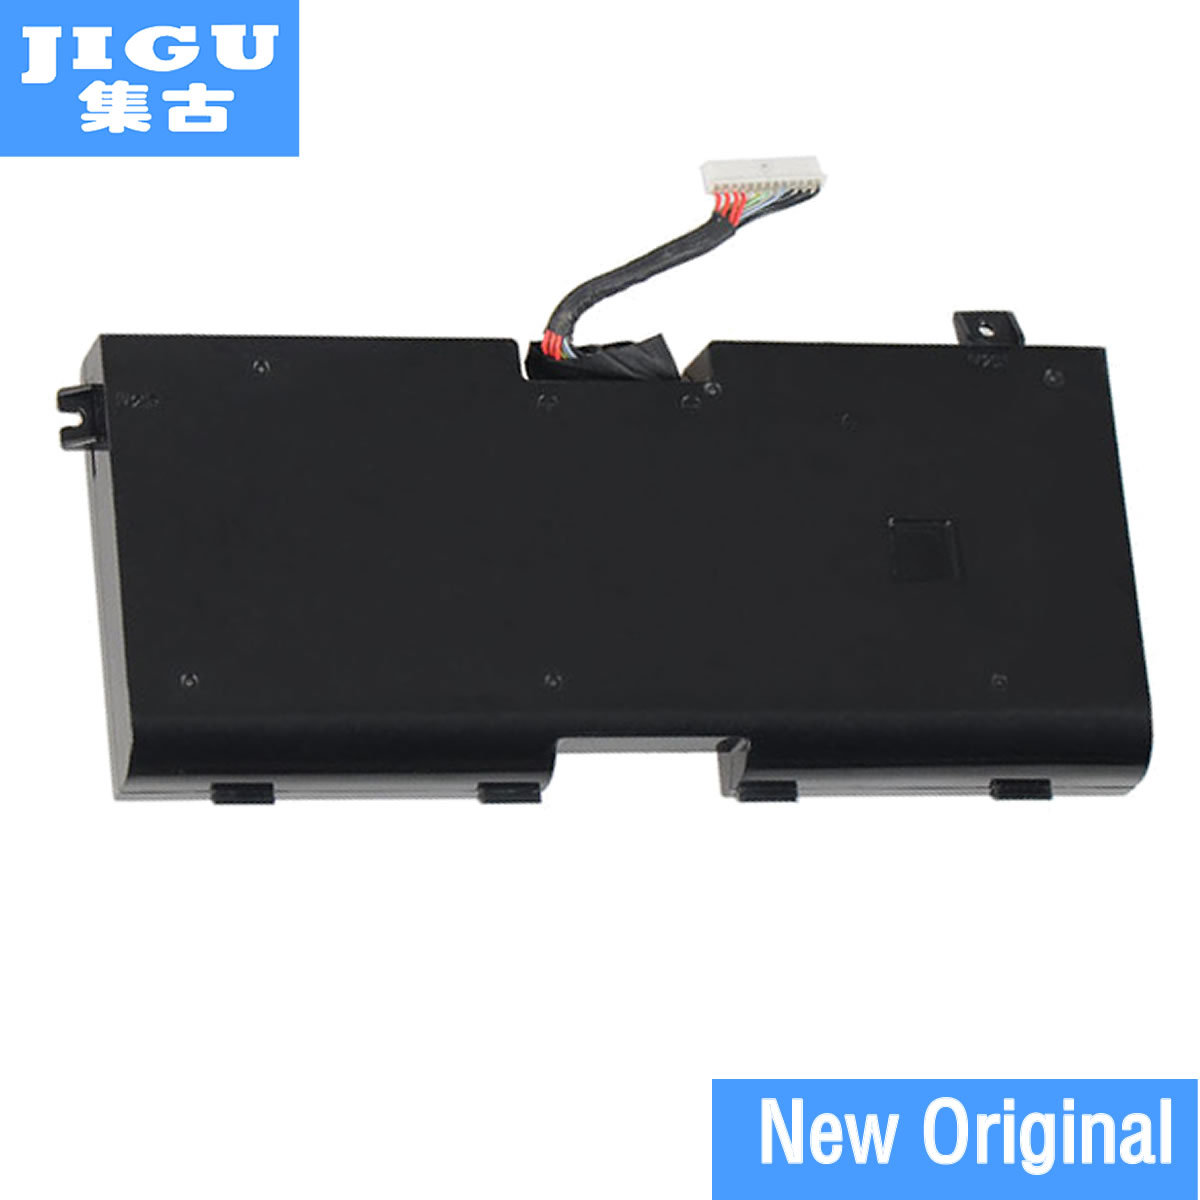 Jigu оригинальный ноутбук Батарея 02F8K3 0G33TT 0KJ2PX 2F8K3 G33TT KJ2PX для DELL Alienware 17 R5 A18 серии M17 M17X M18X